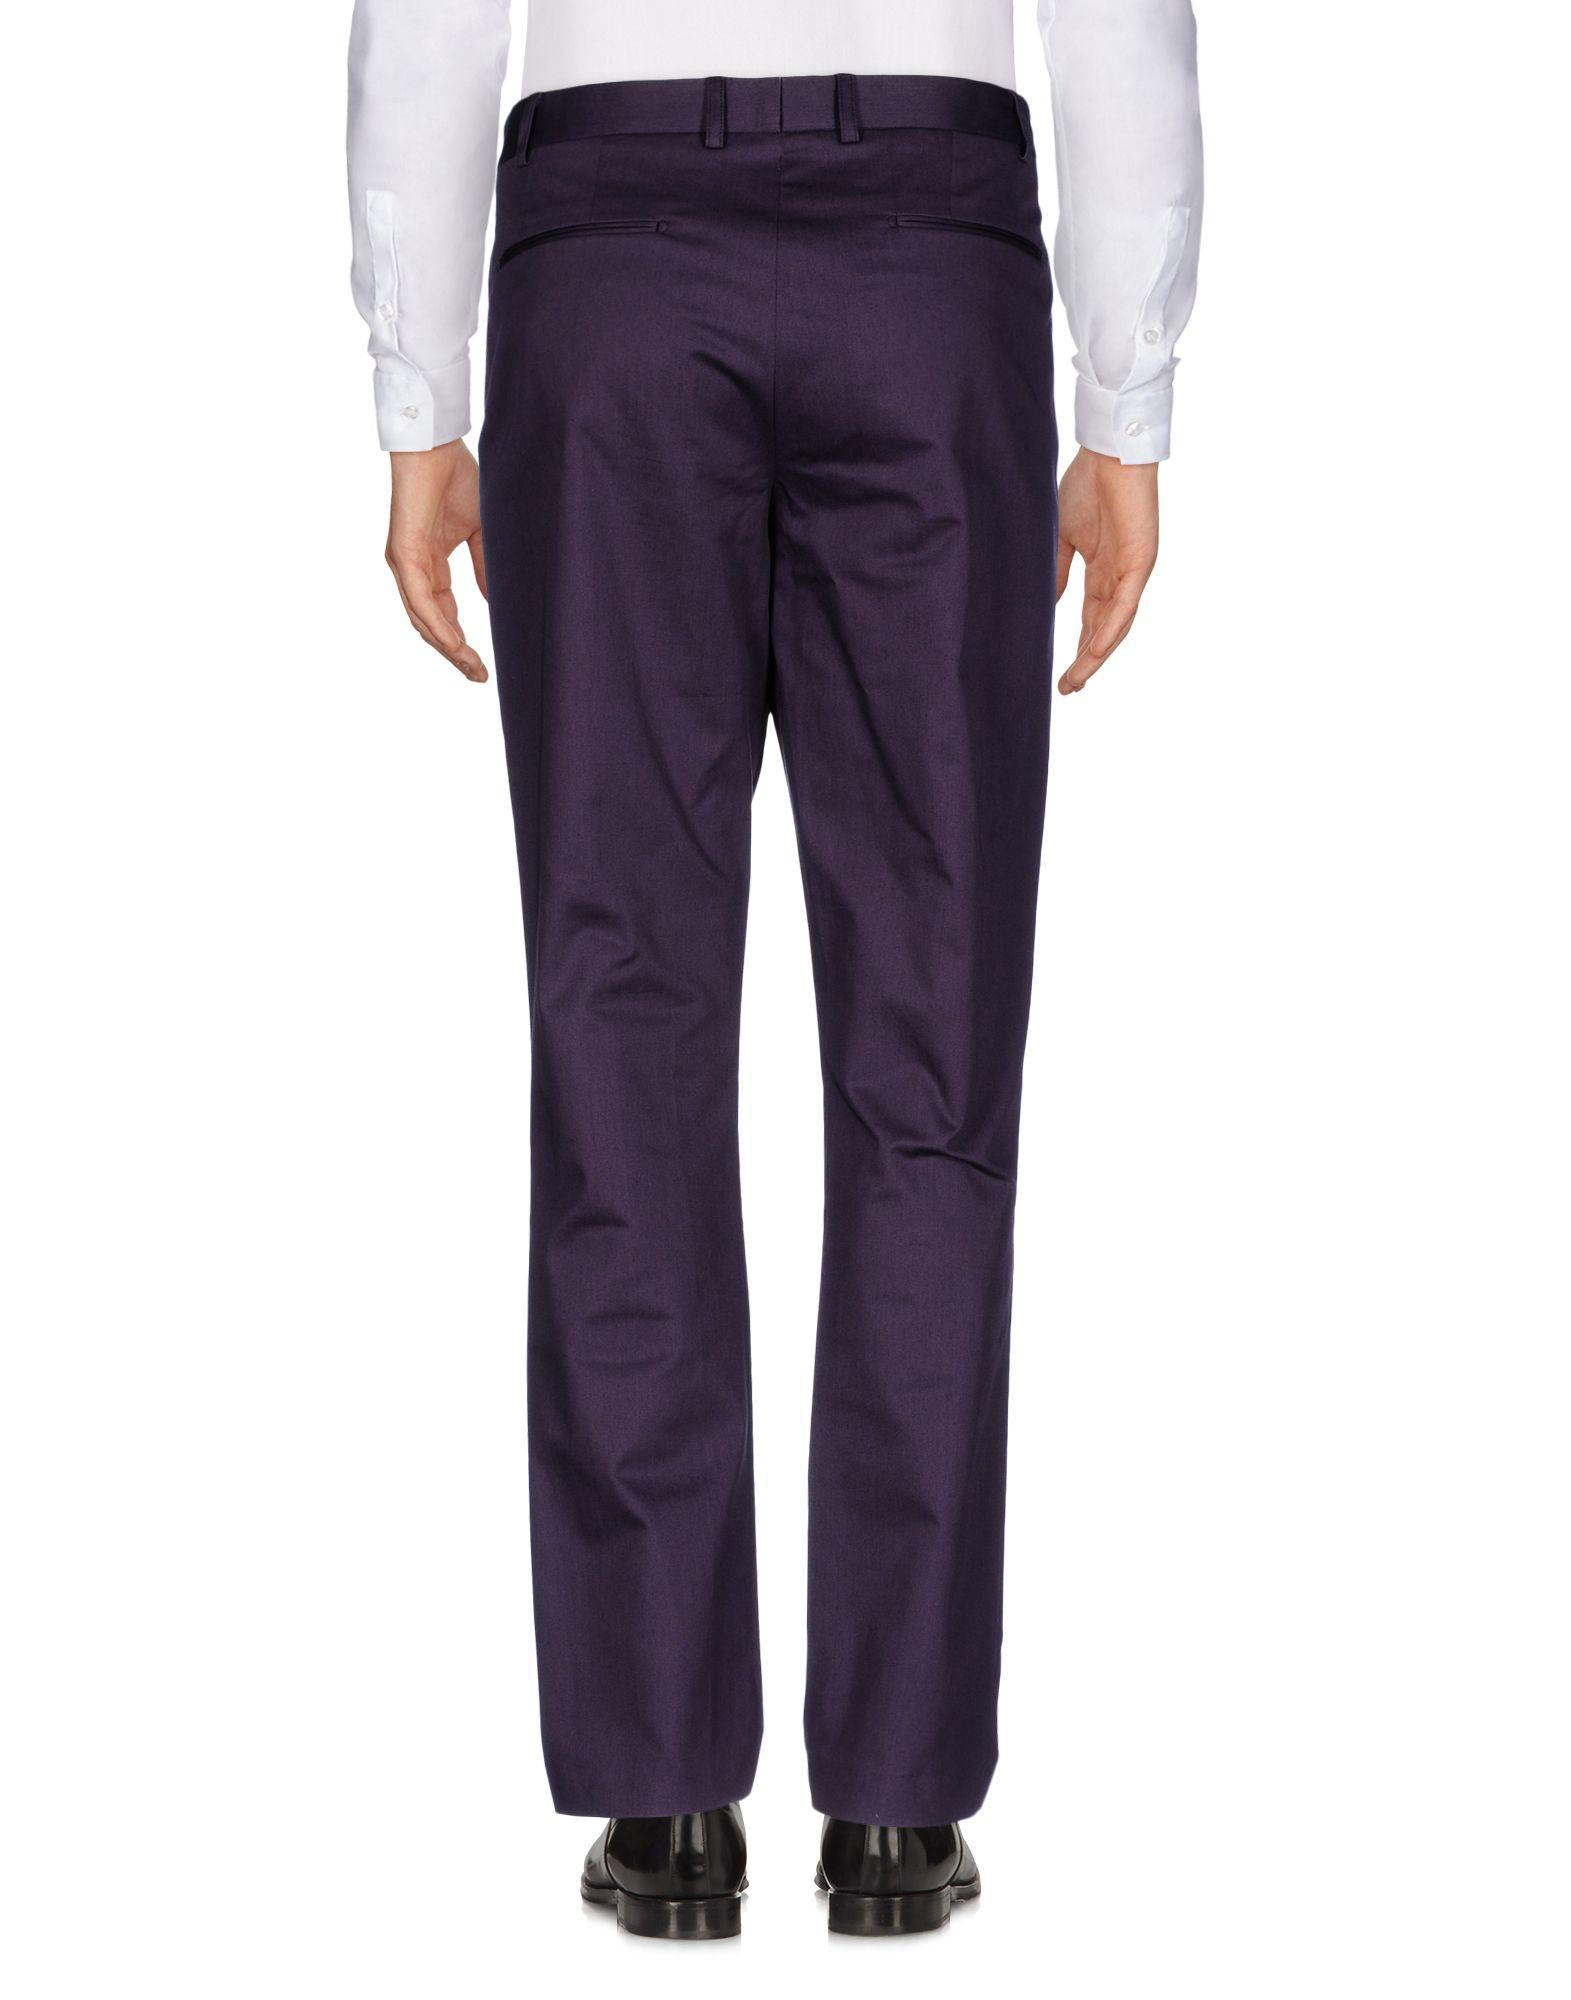 Pantalone Pantalone Pantalone Ps By Paul Smith Uomo - 13120087TF 68e4ee